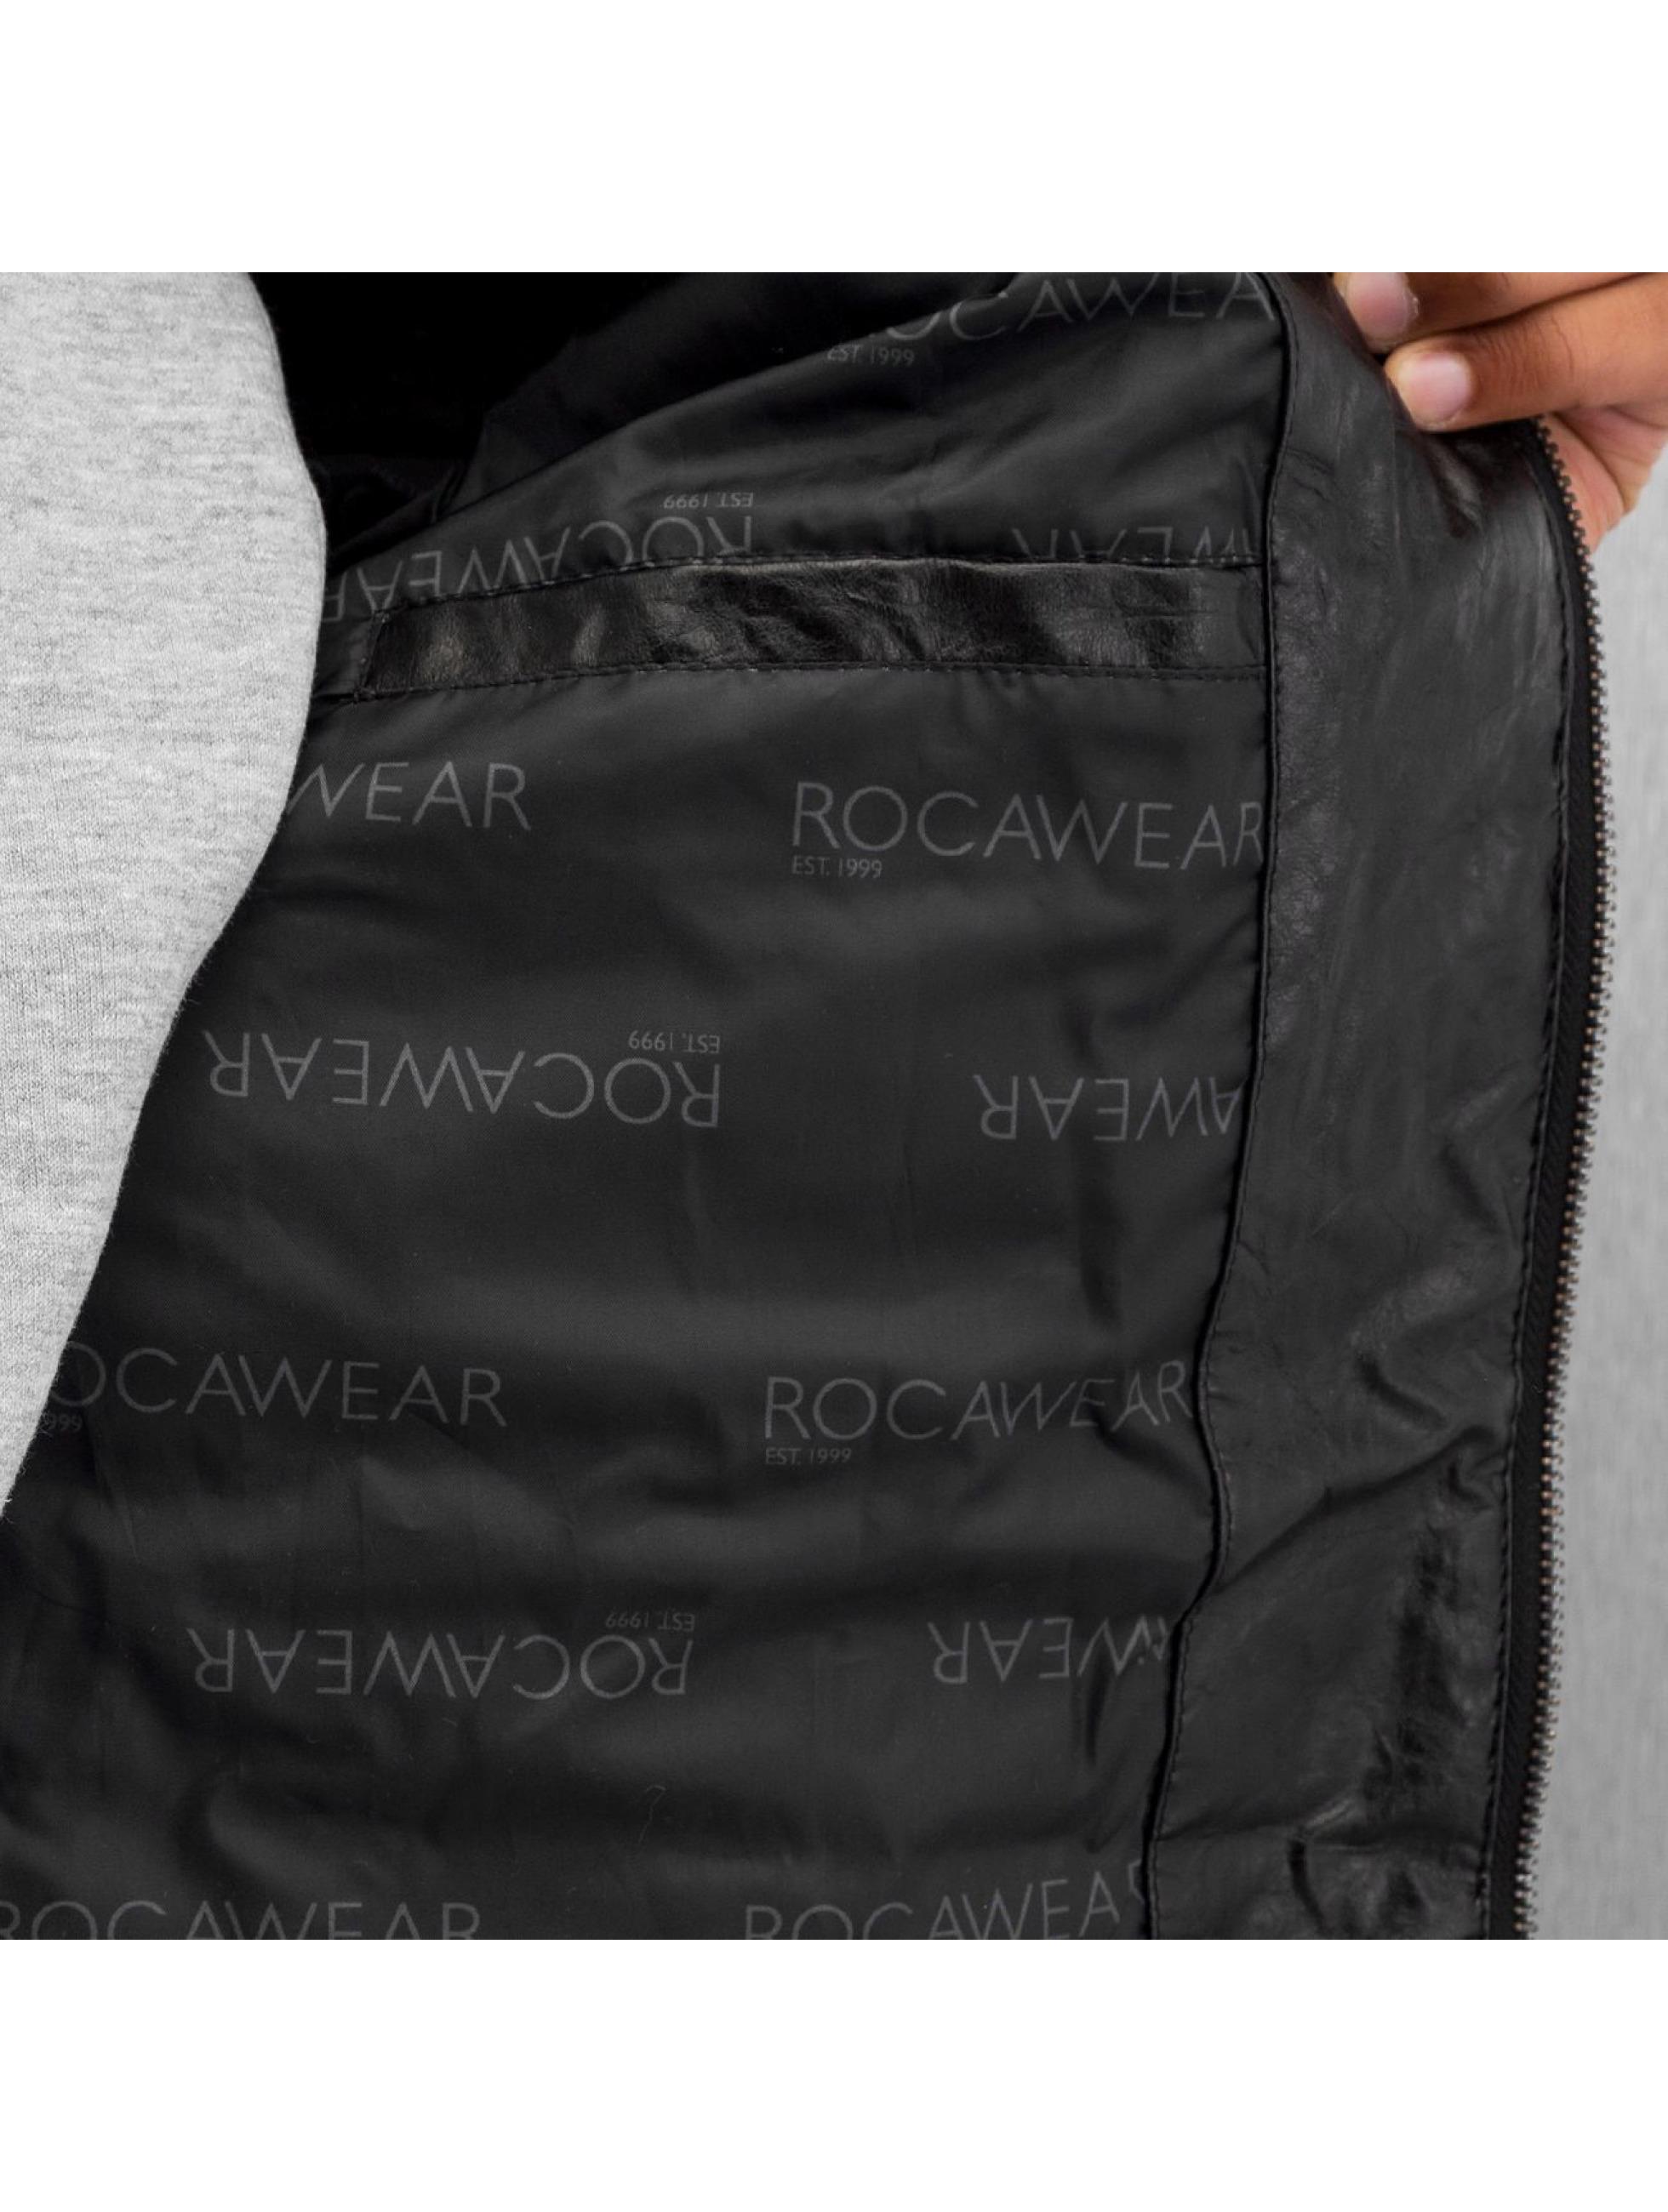 Rocawear Talvitakit Roc Quilt musta